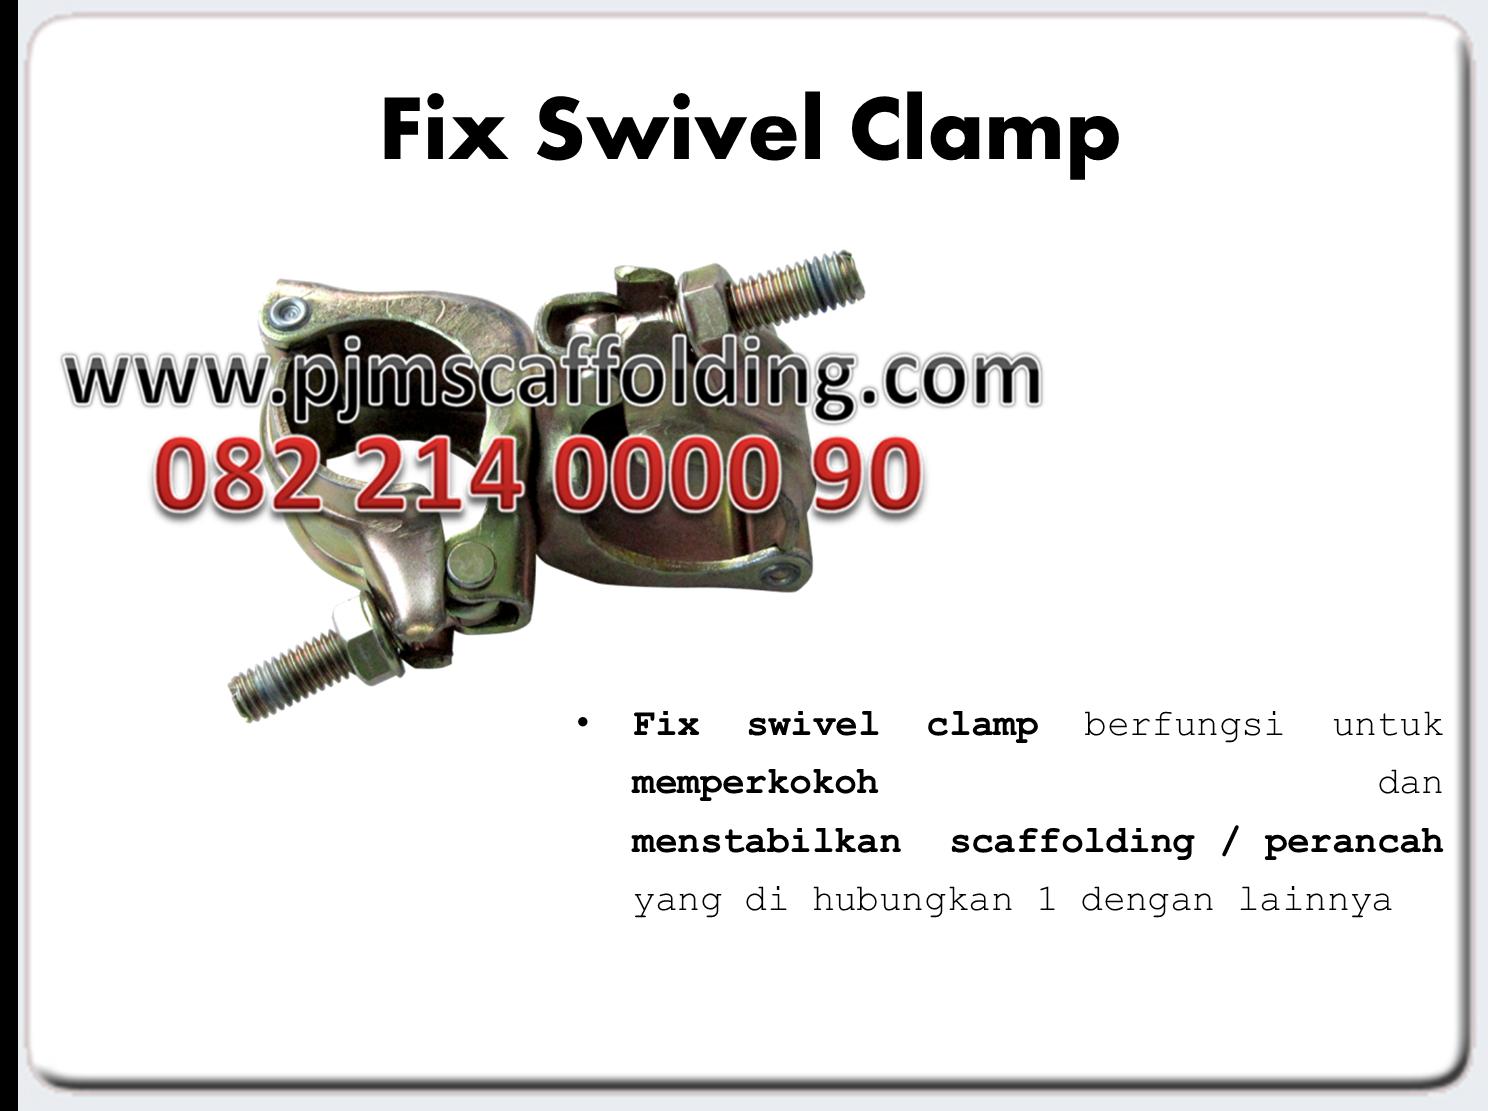 FixSClamp